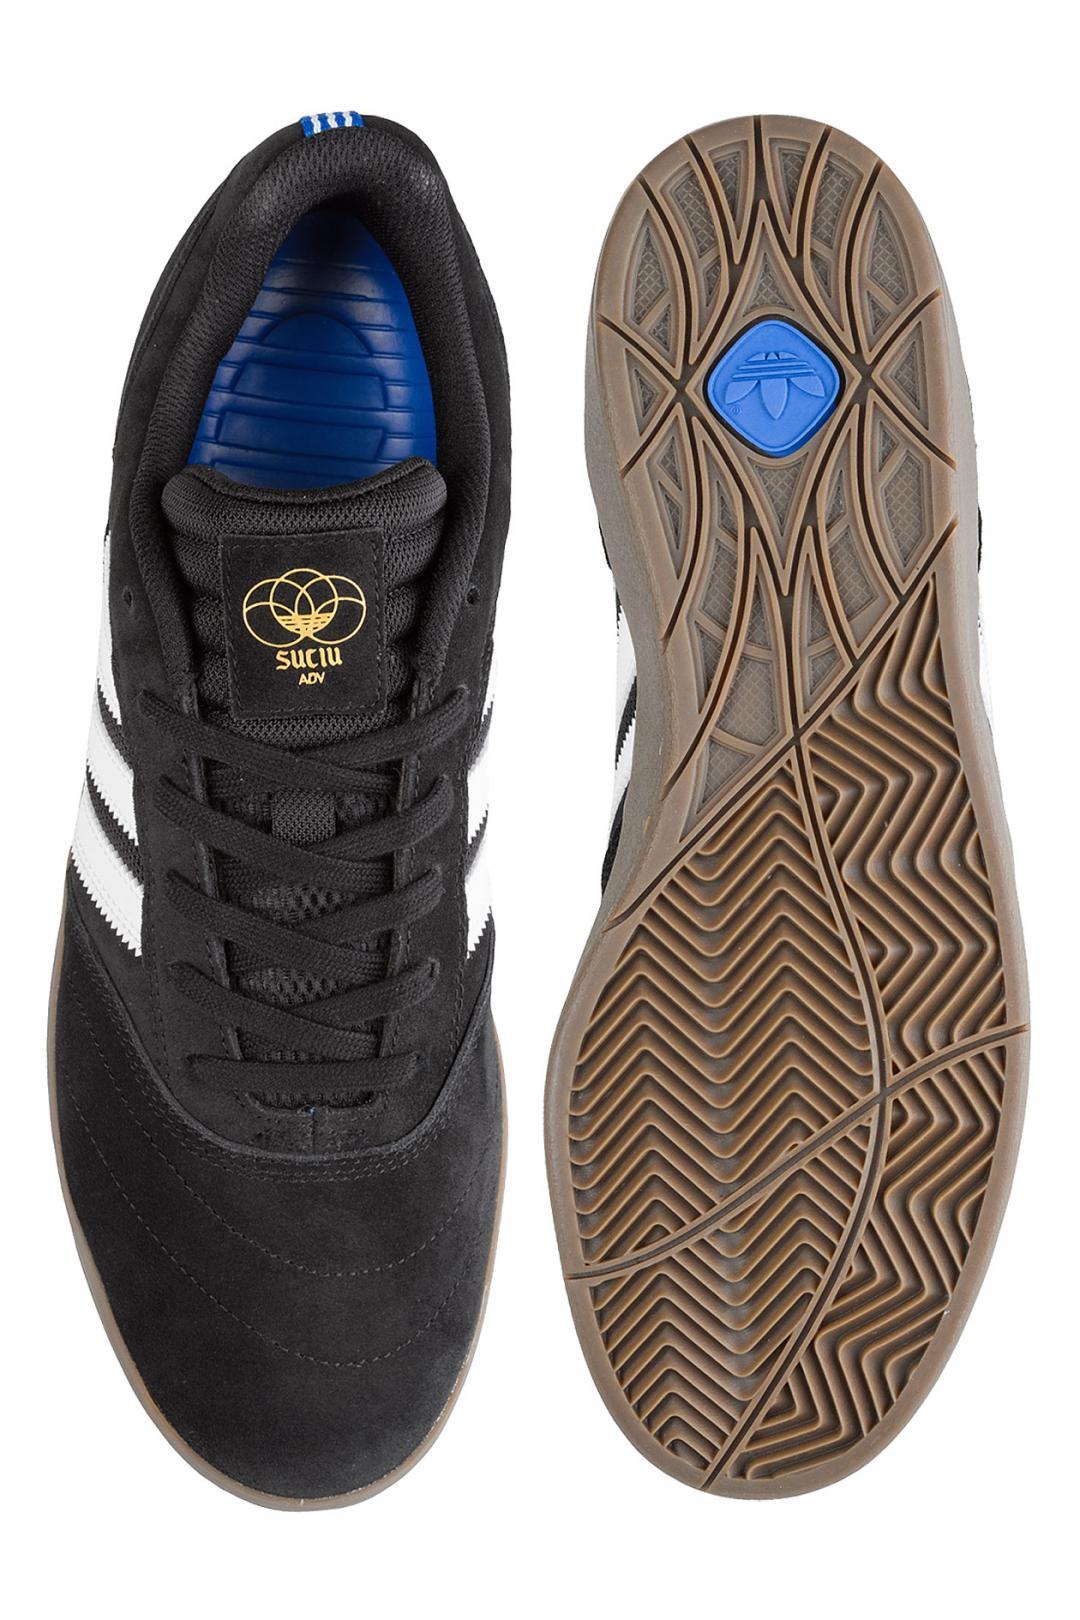 Uomo adidas Skateboarding Suciu ADV II core black white gum   Scarpe da skate